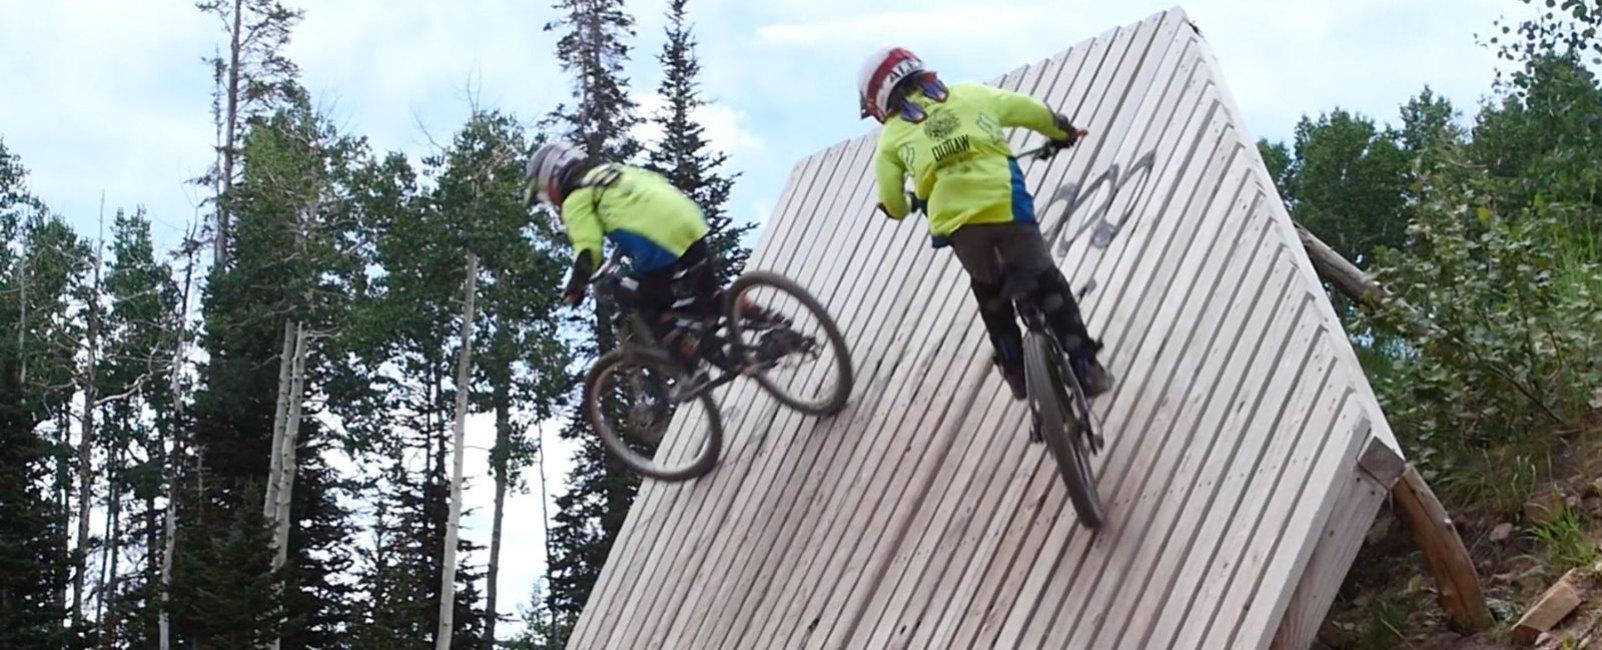 9-Year-Old Twins Mountain Bike Park City Mountain